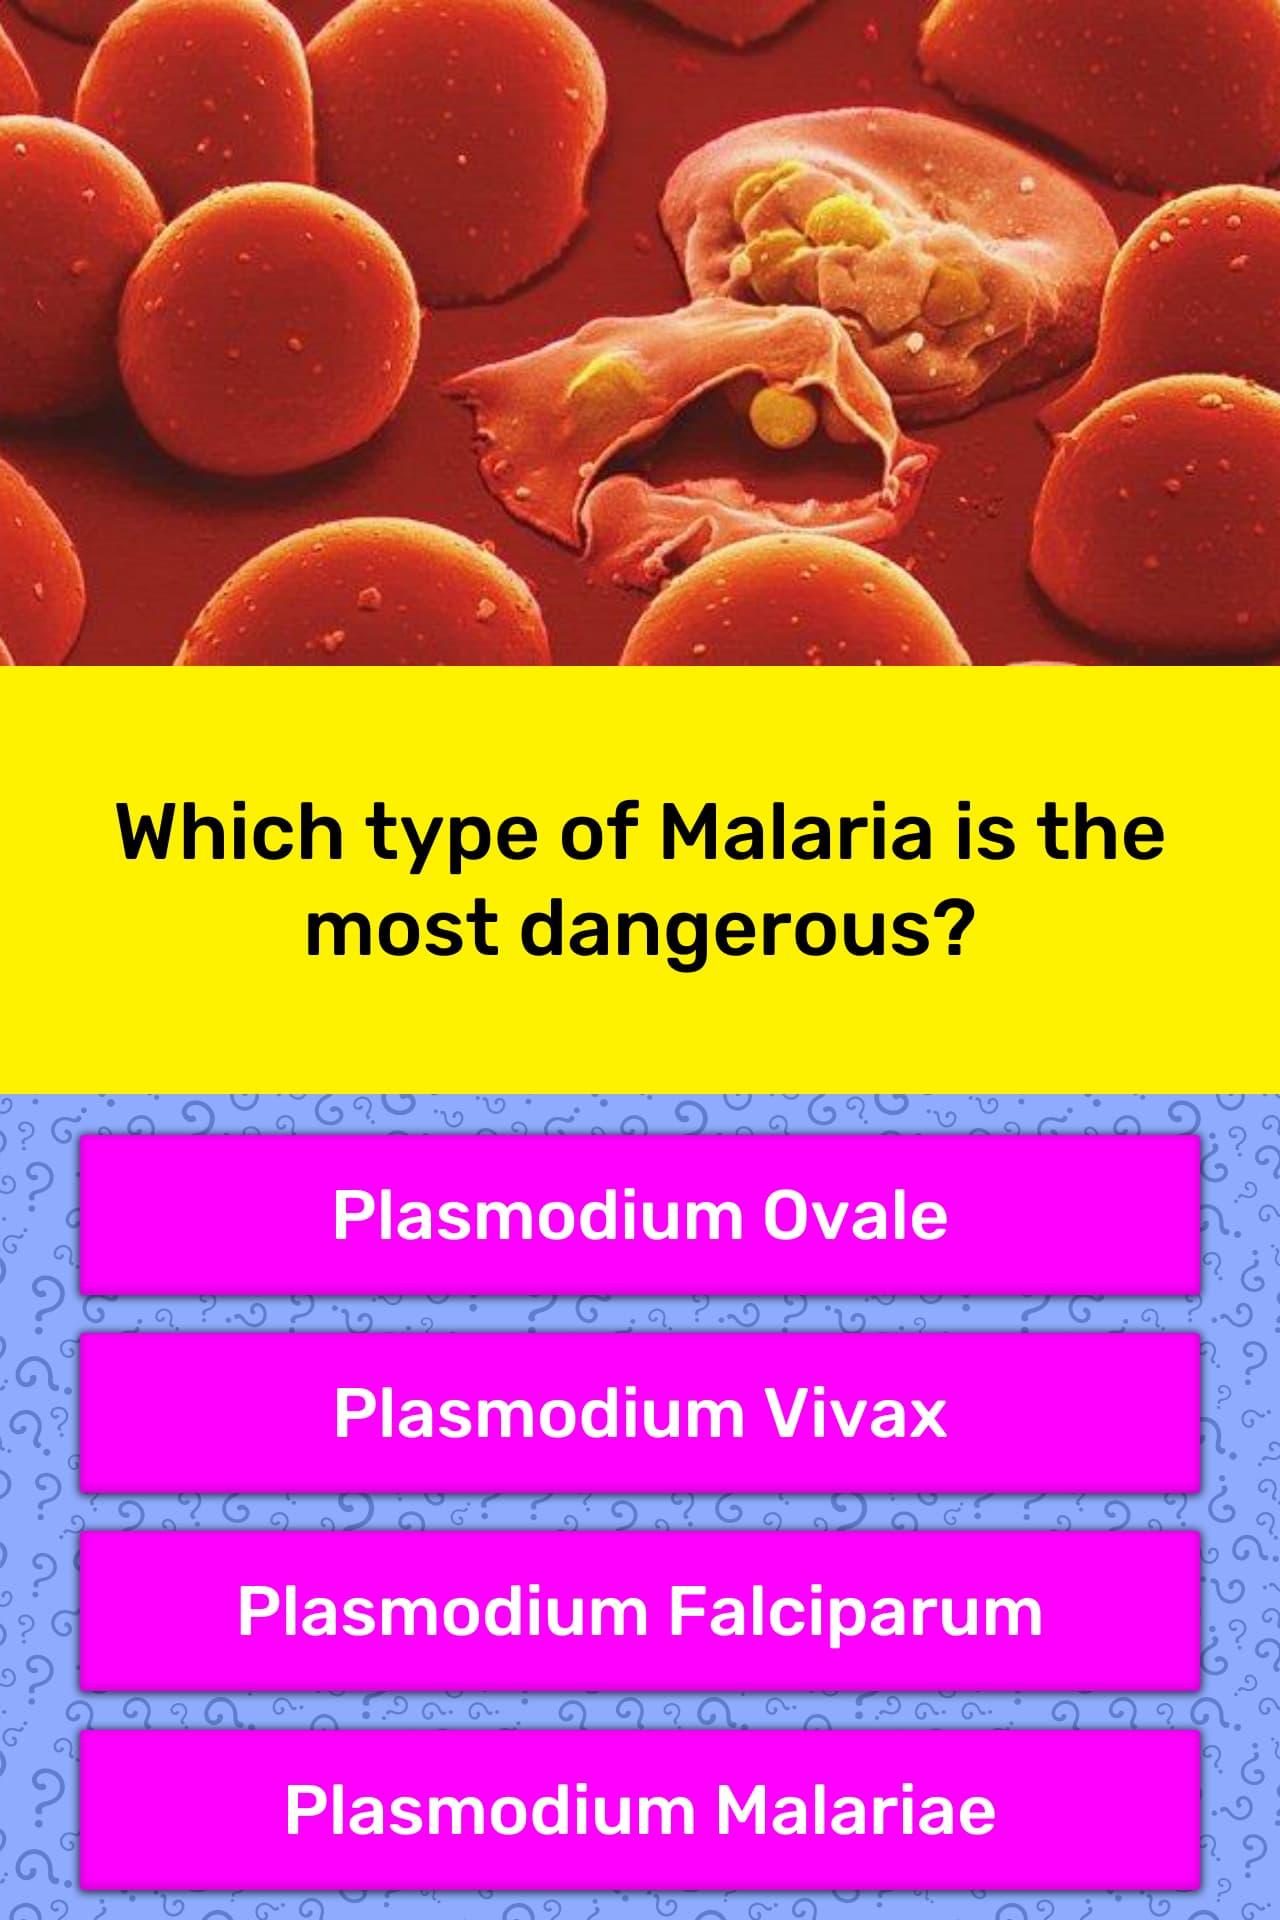 what type of malaria